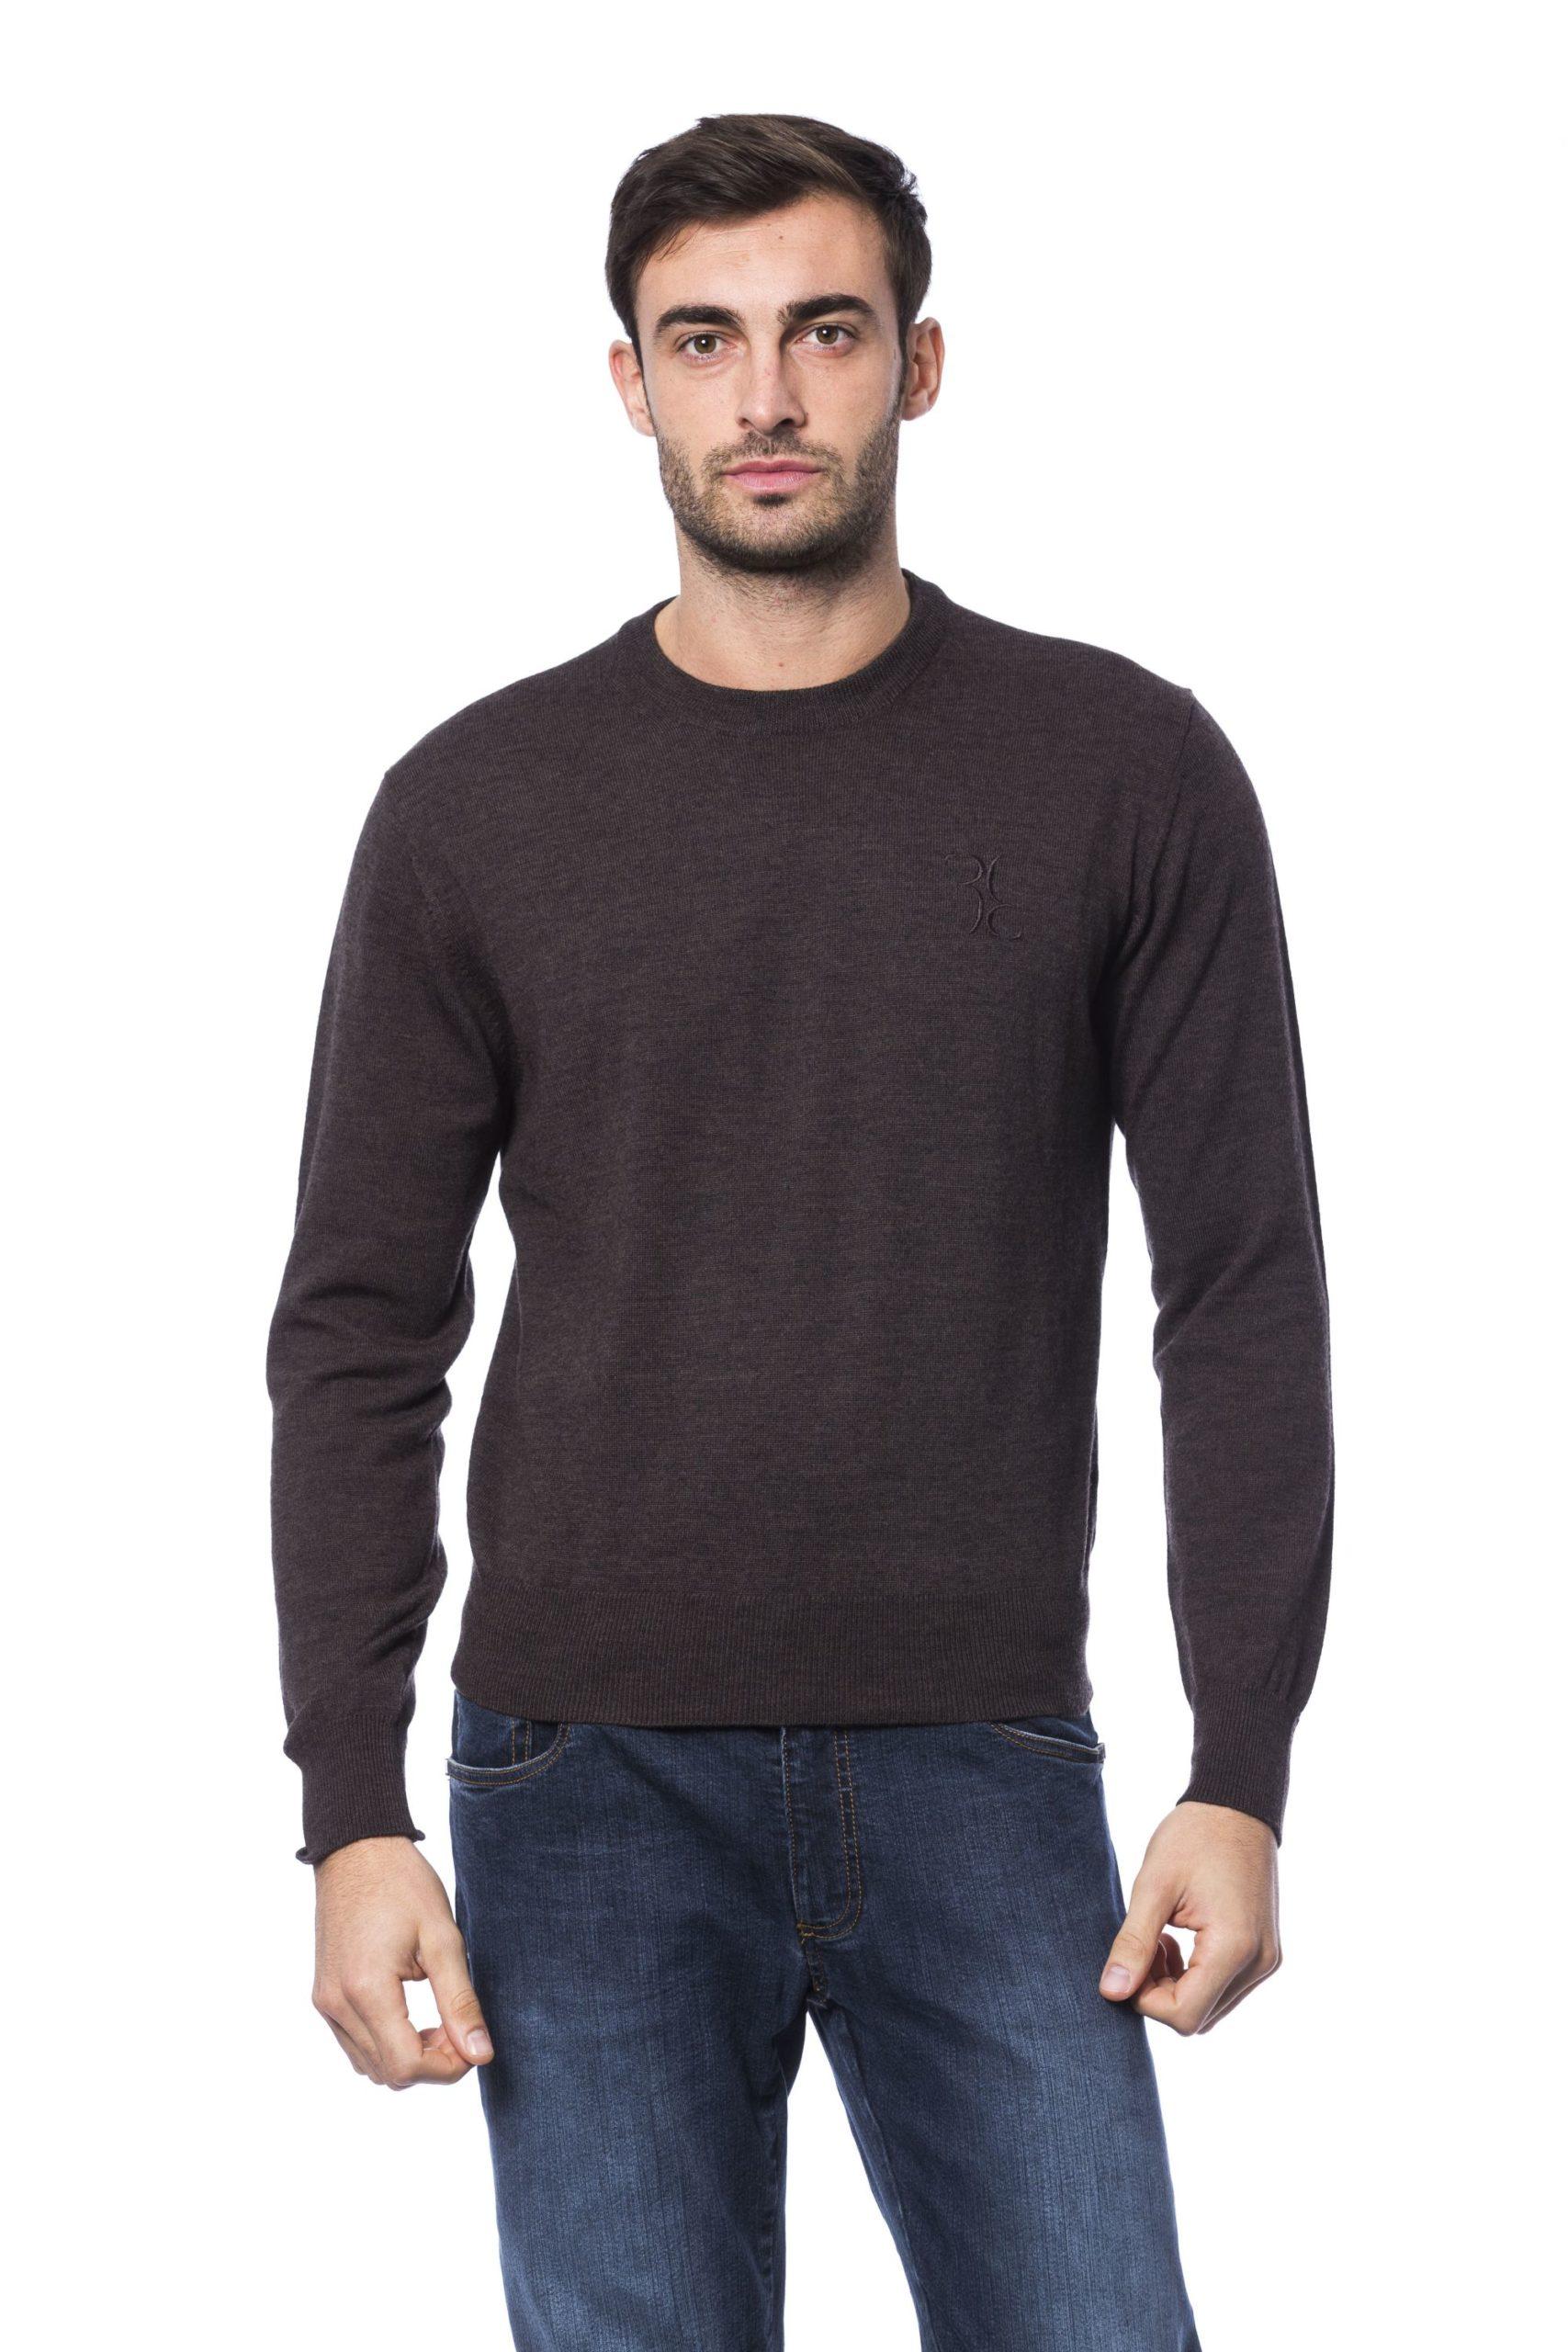 Billionaire Italian Couture Men's Marr Sweater Brown BI1281220 - S